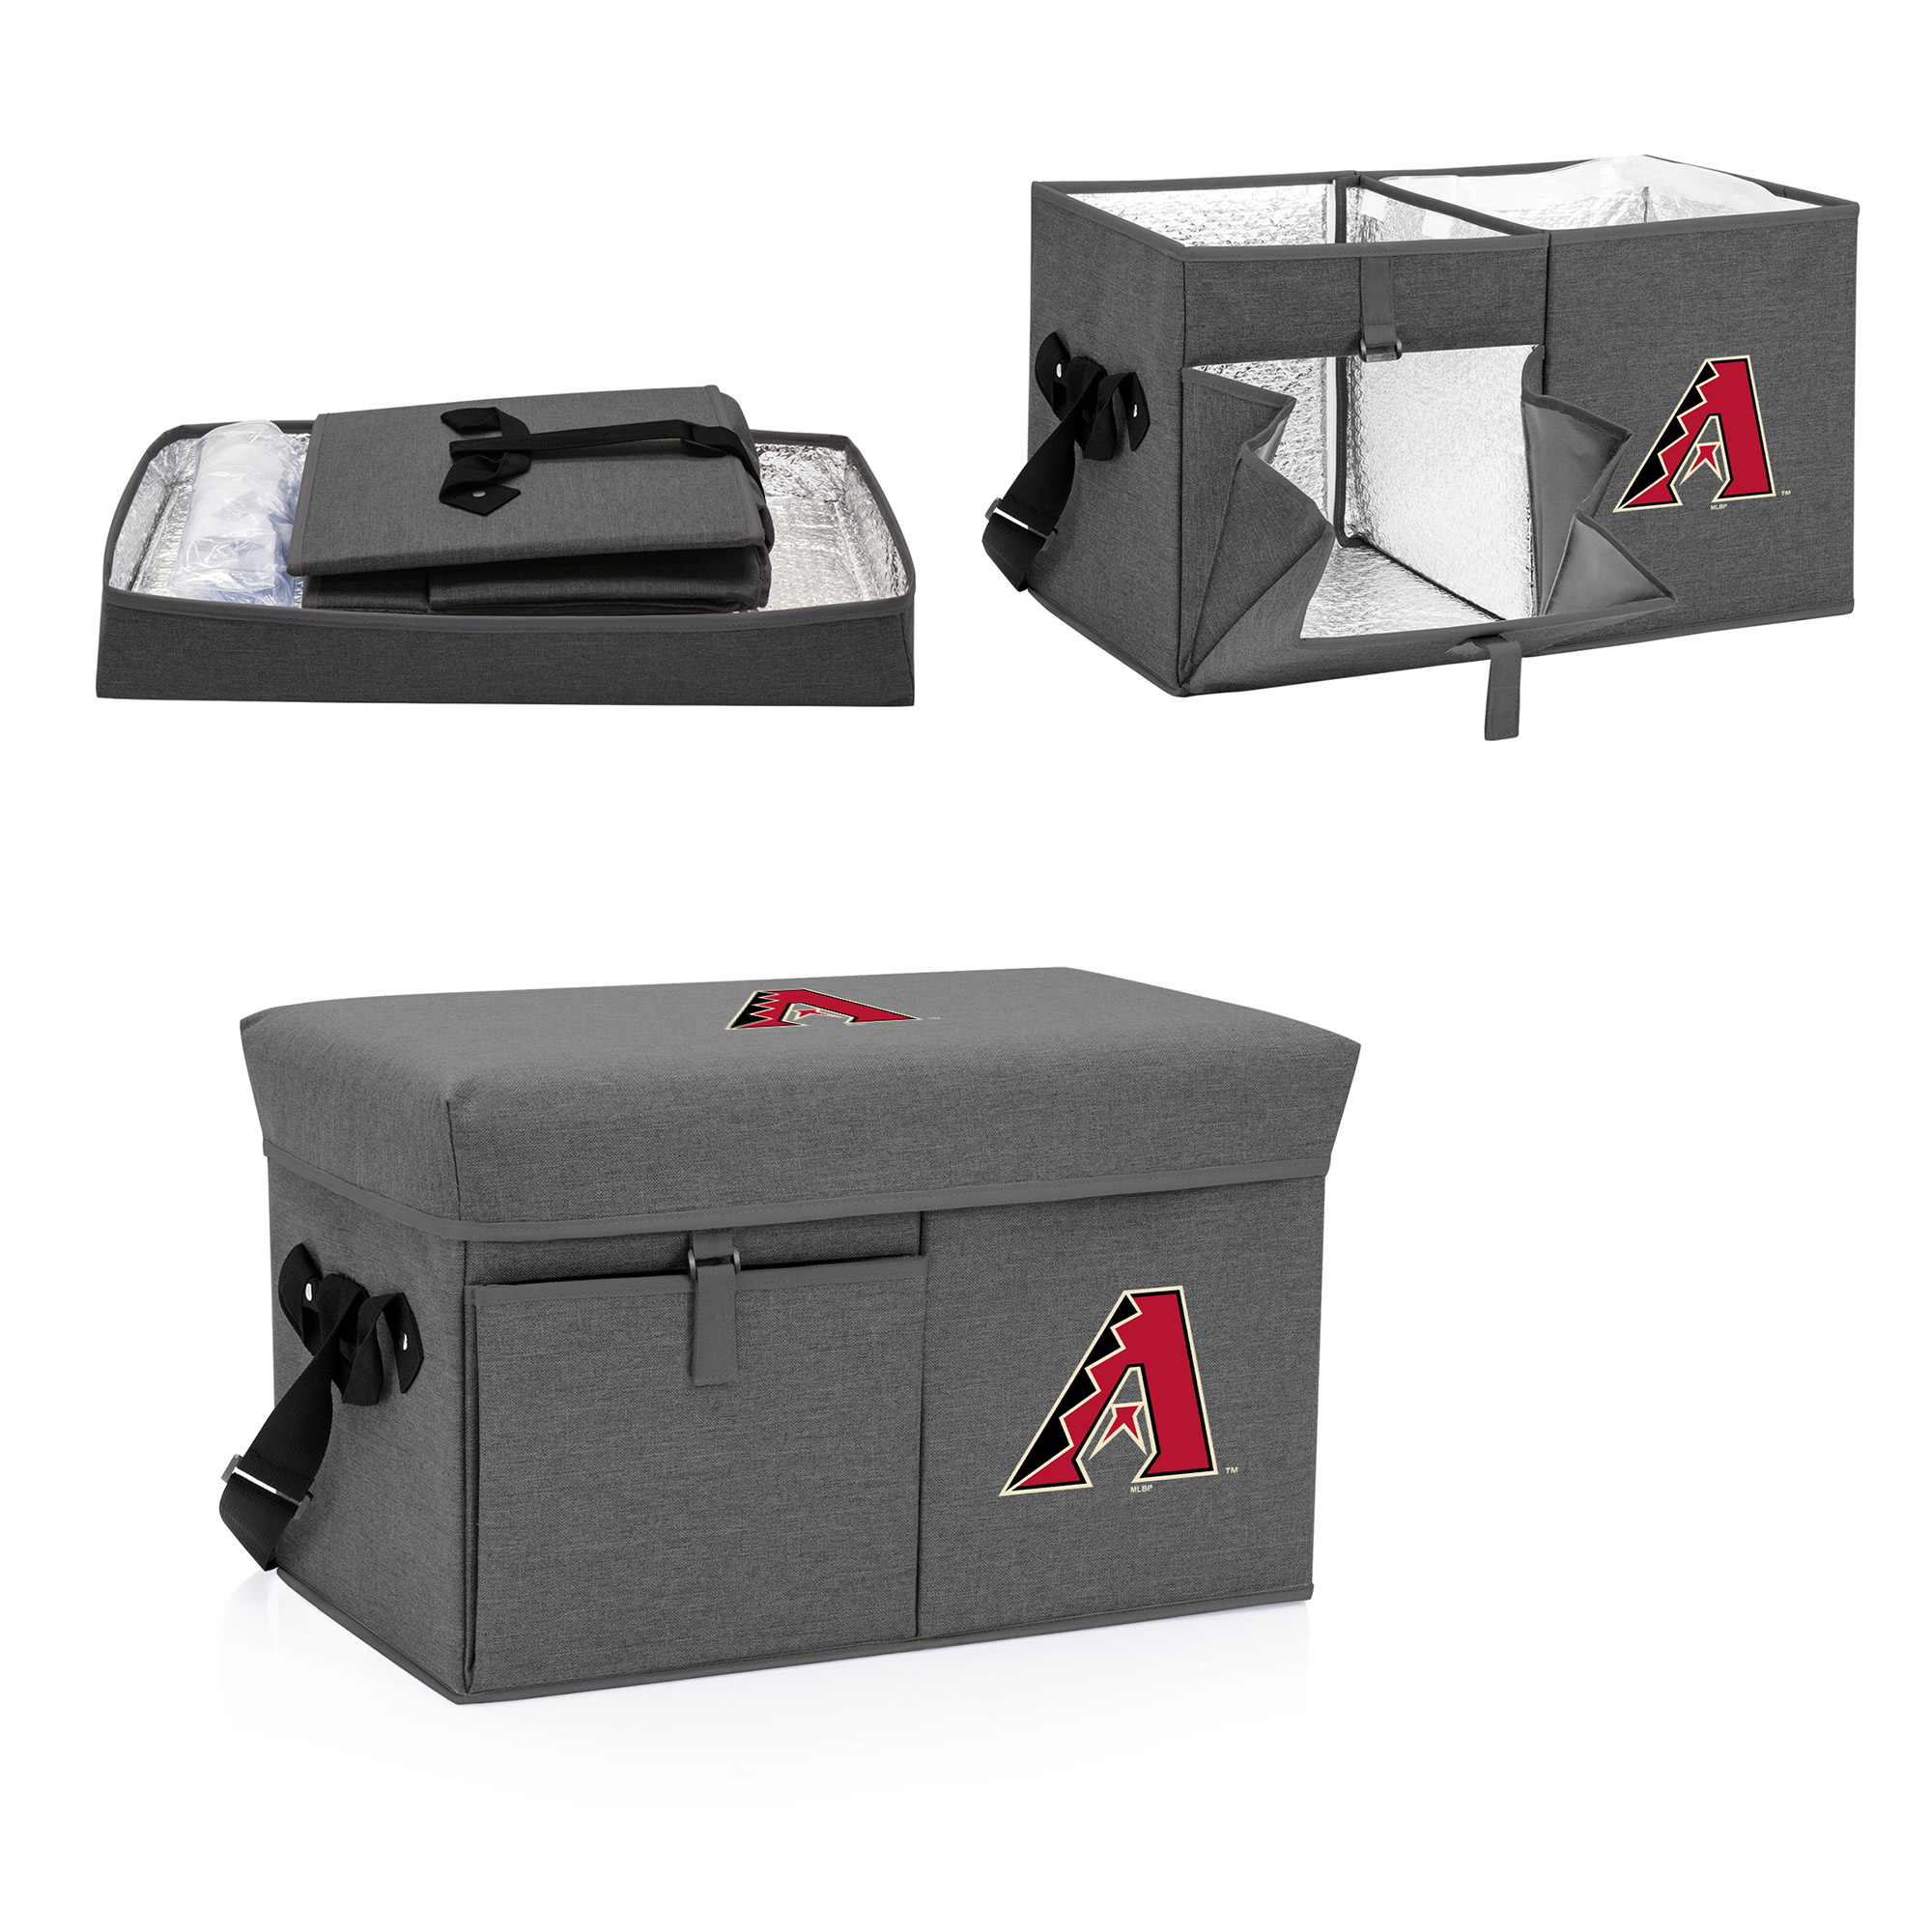 Arizona Diamondbacks Ottoman Cooler & Seat - Gray - No Size